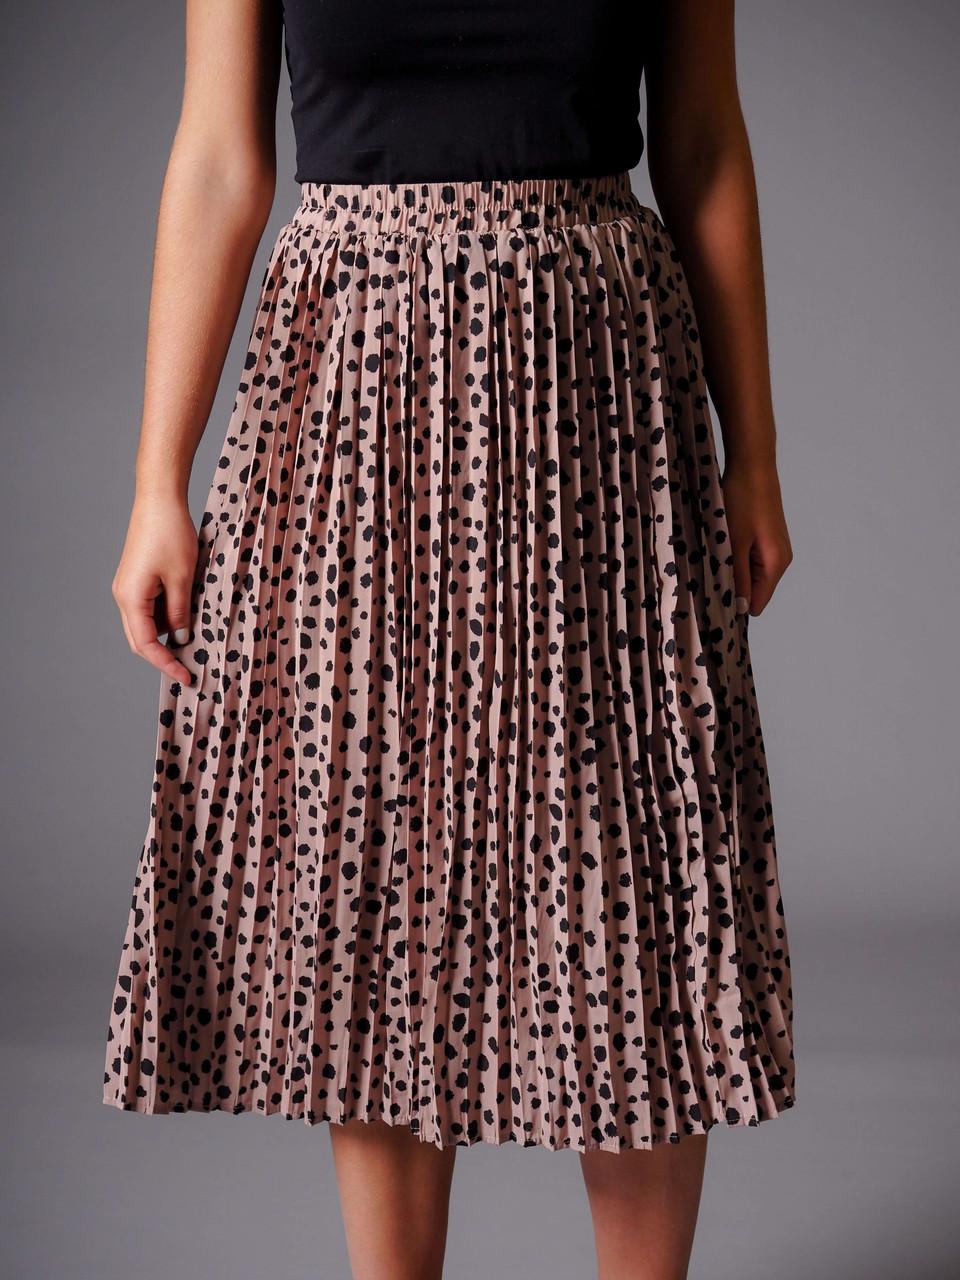 cheetah animal print midi skirt